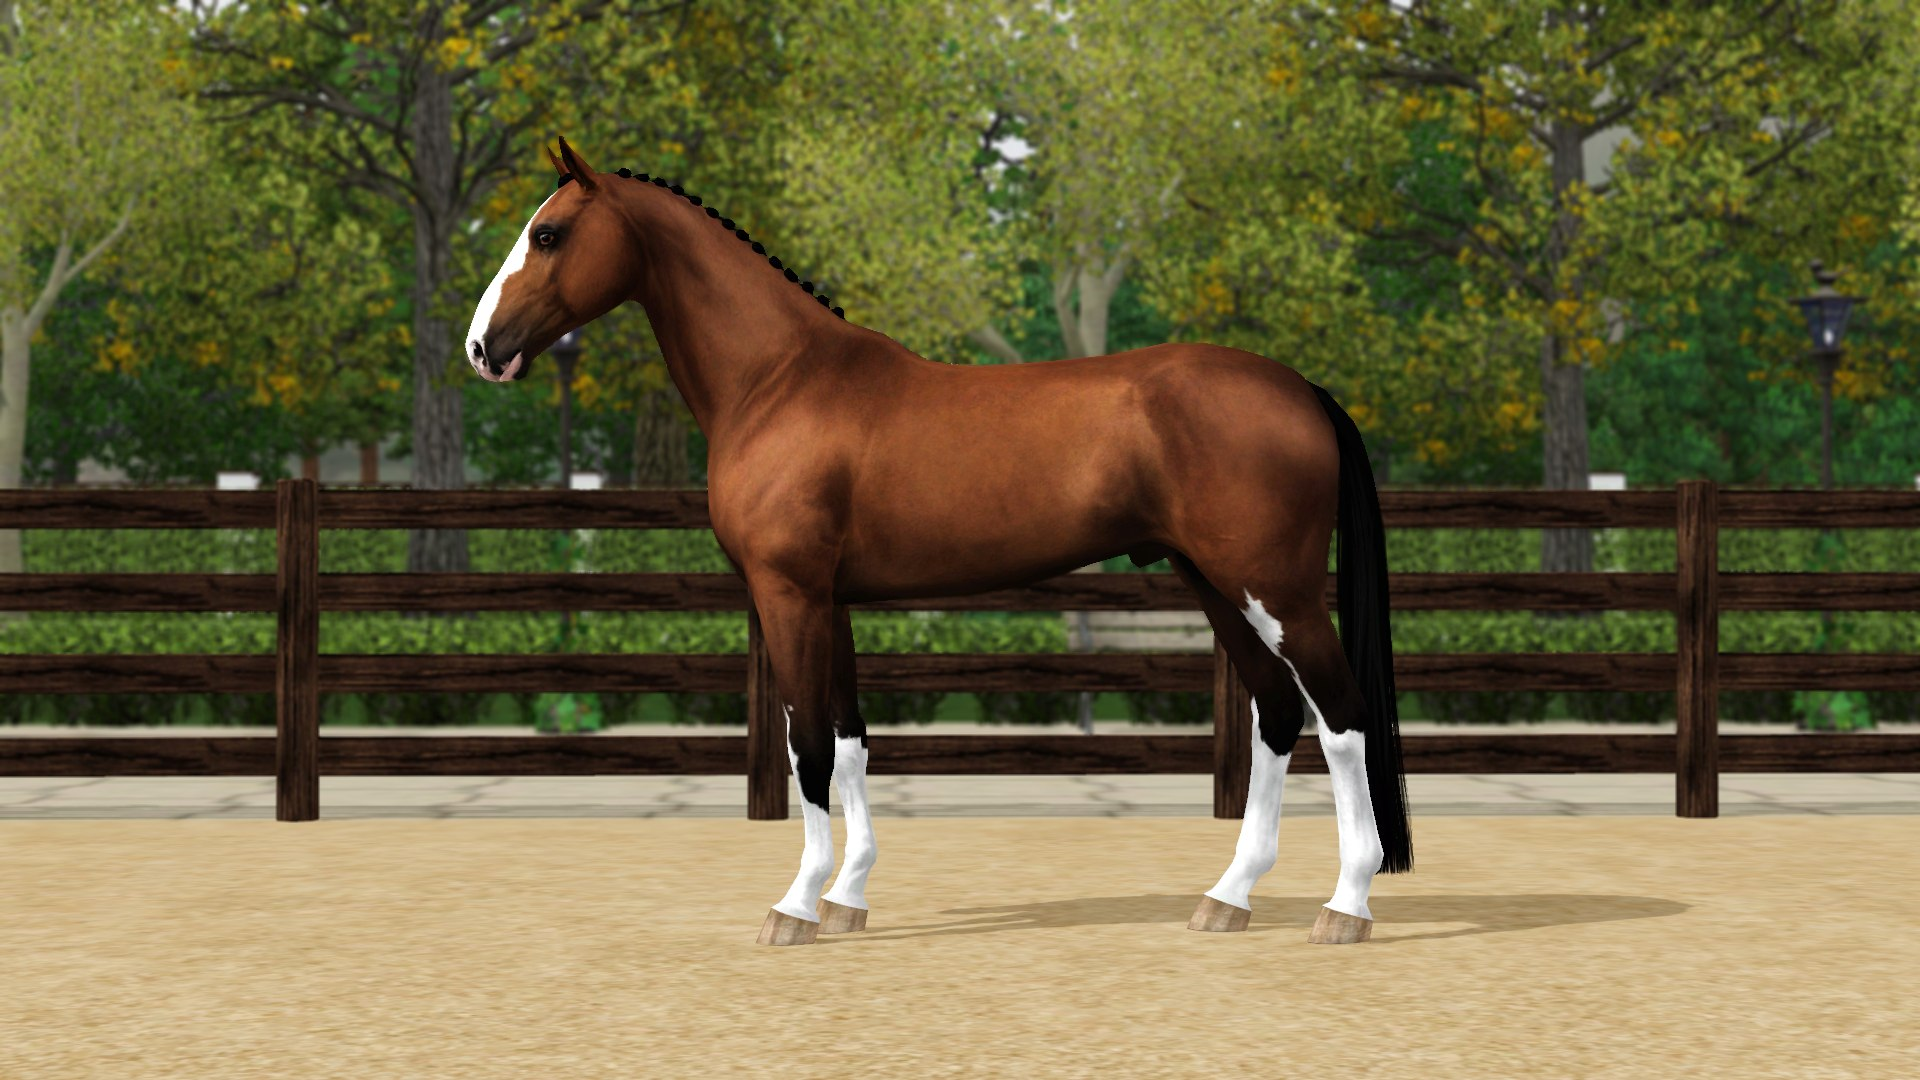 Регистрация лошадей в RHF 2 - Страница 7 MKvm1uxlubw